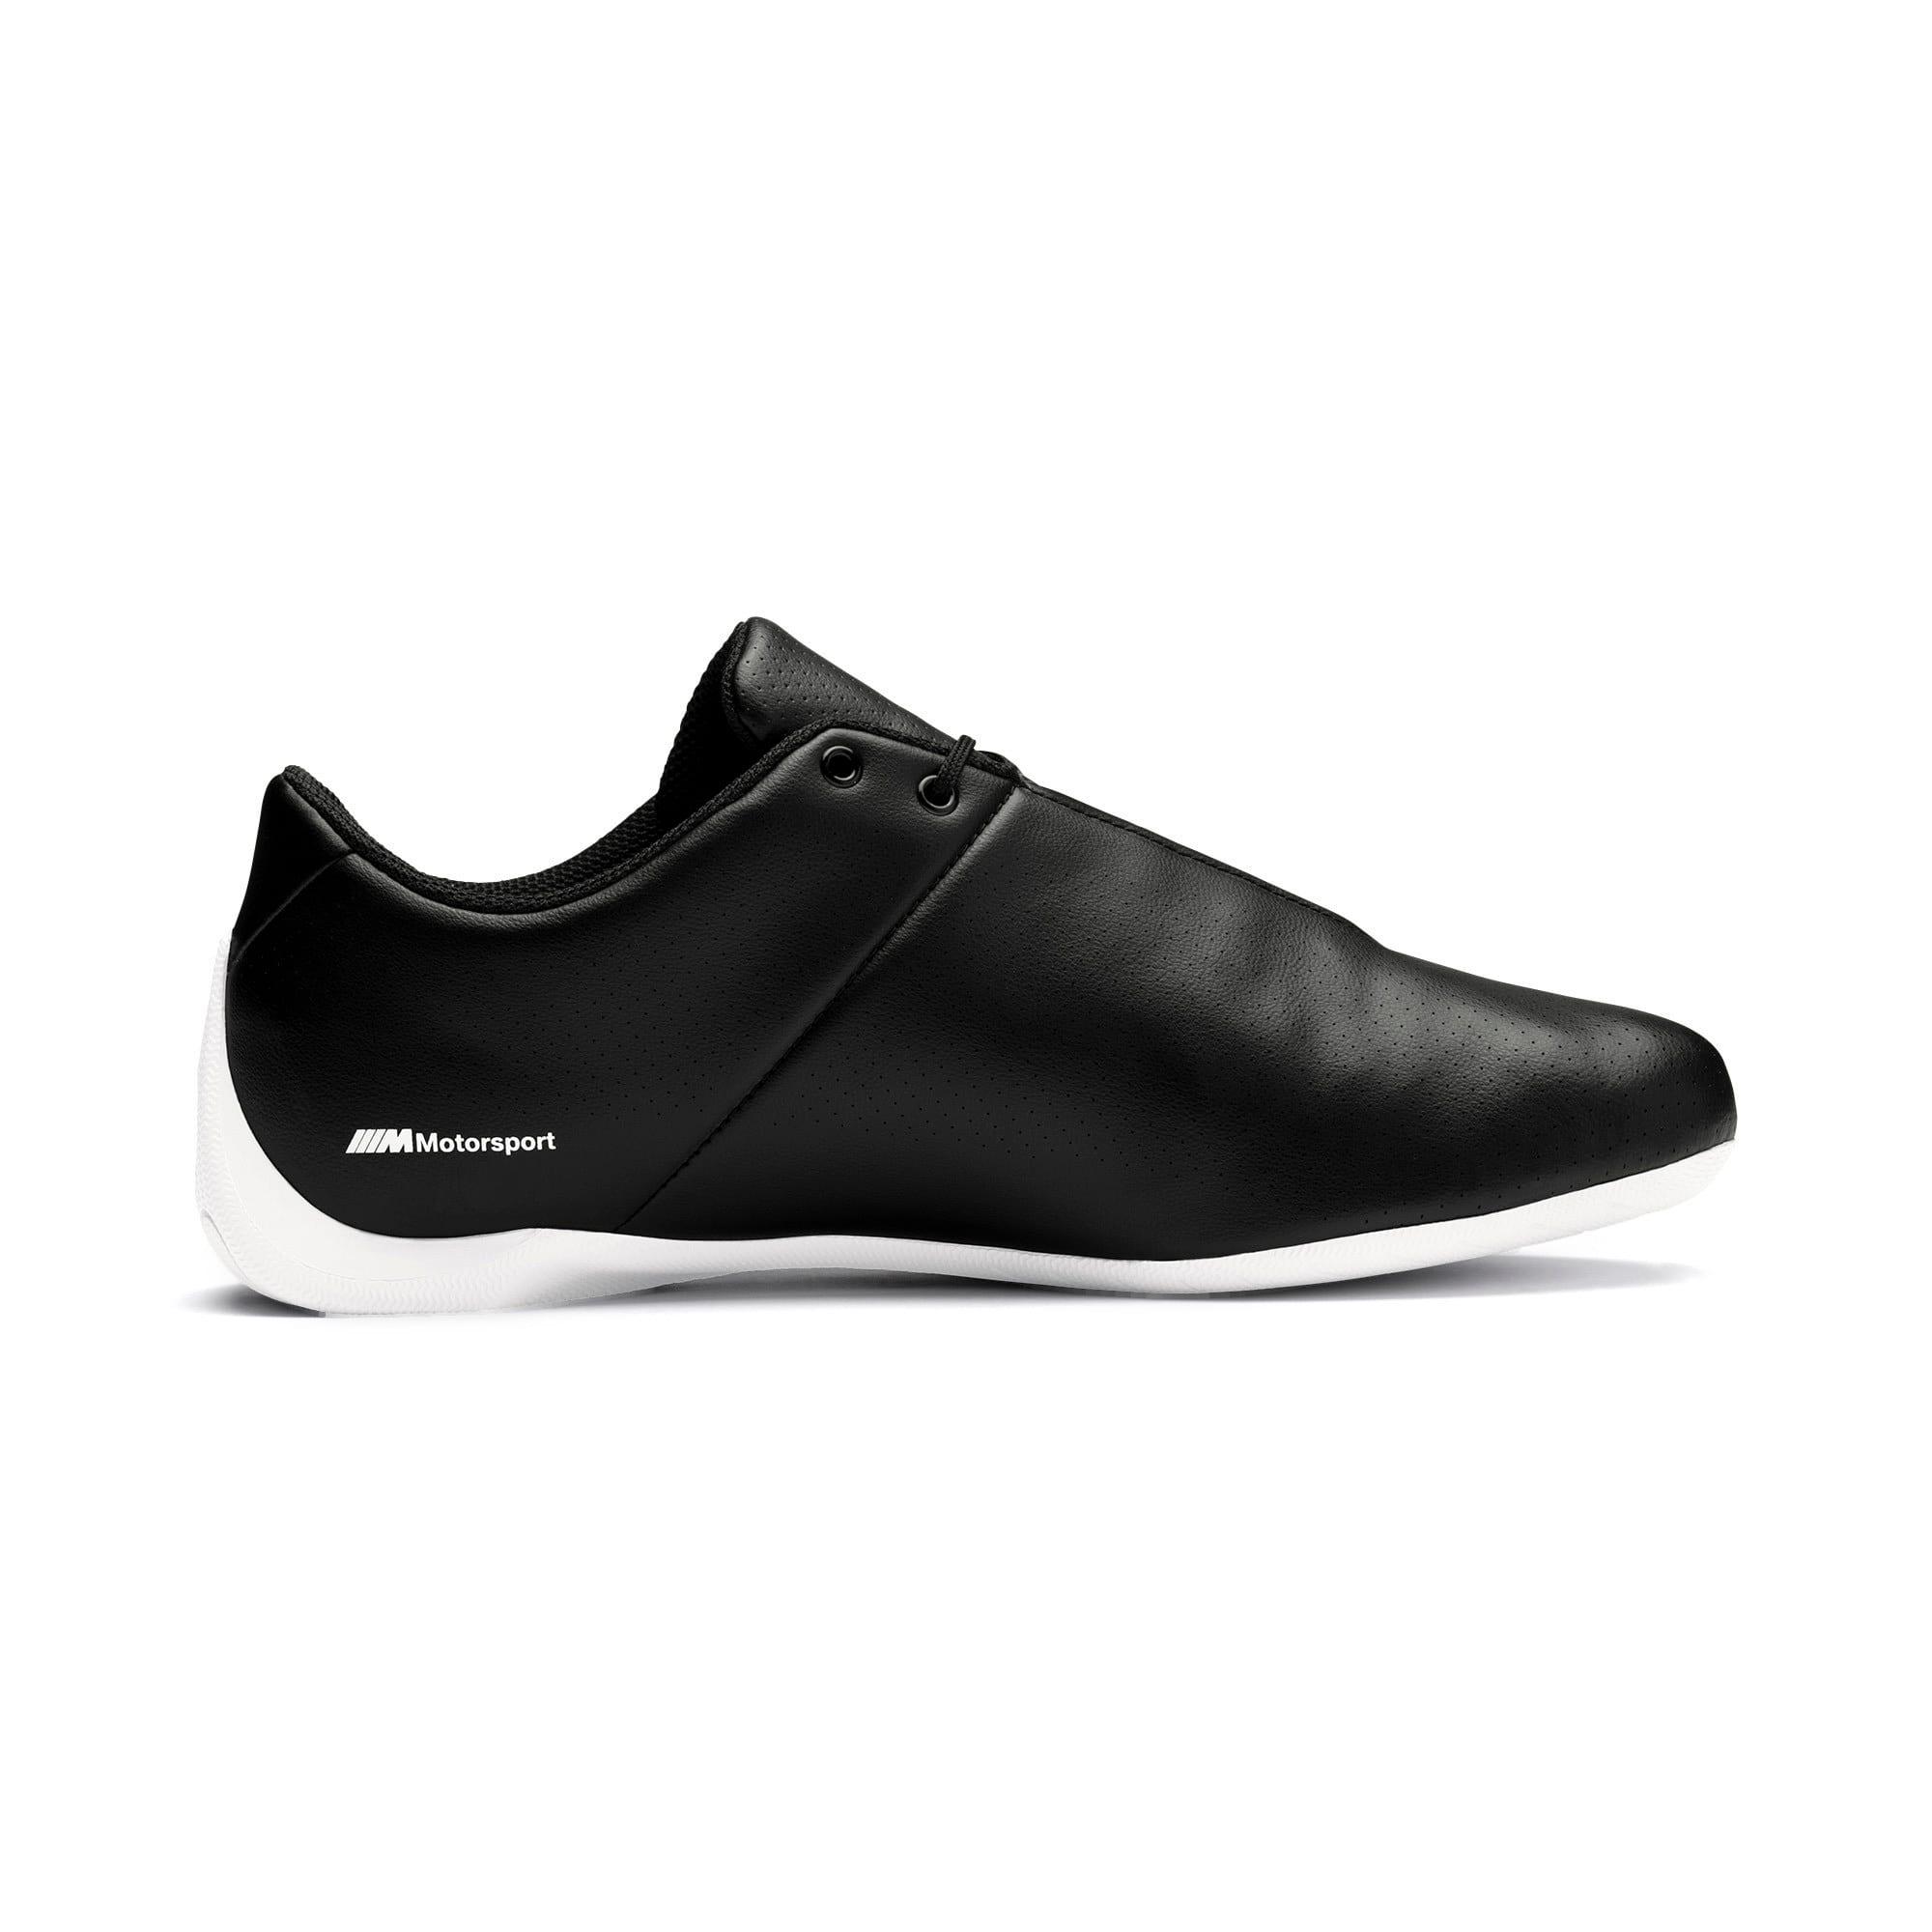 Thumbnail 5 of BMW Motorsport Future Cat Ultra sneakers, Black-White-Gray Violet, medium